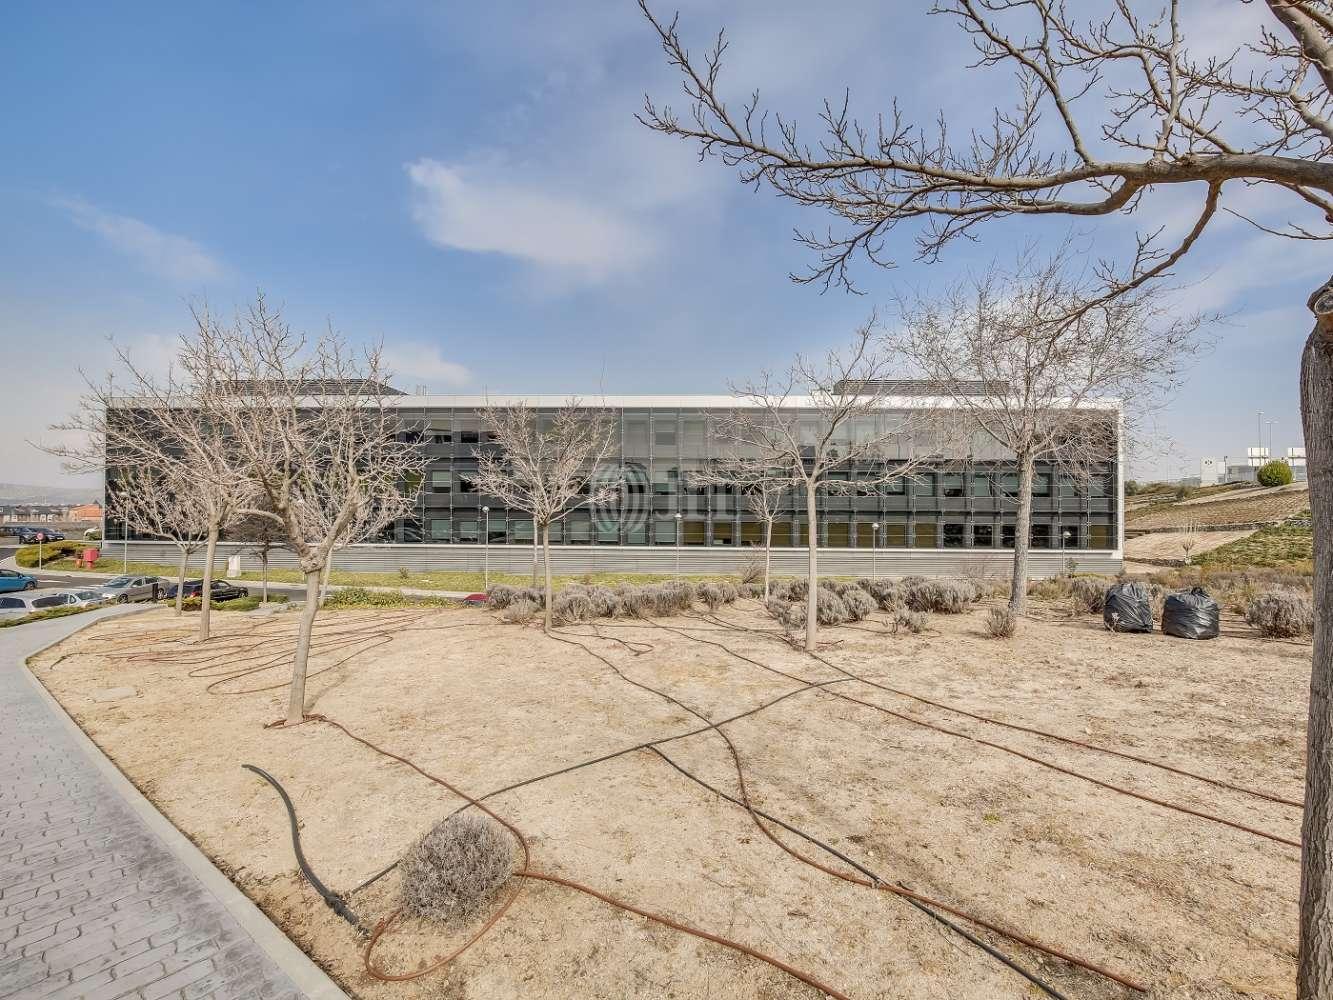 Oficina Las rozas de madrid, 28232 - Edificio 3. P.E. Alvia